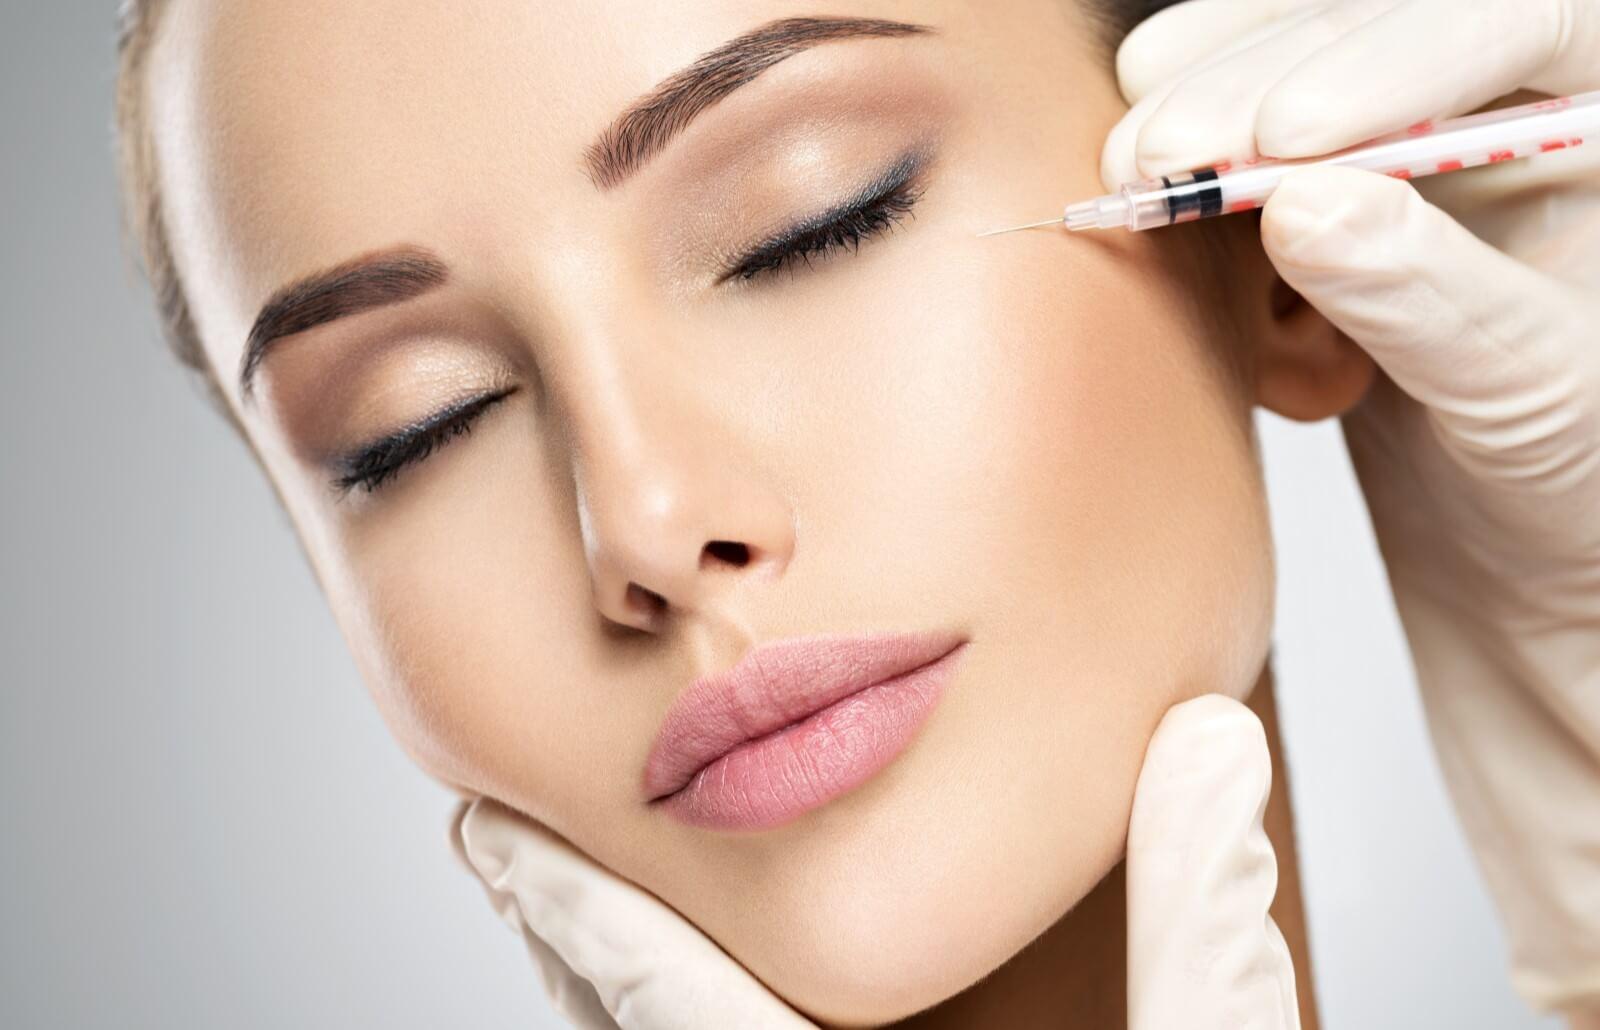 Ways to Rejuvenate the Skin Around Your Eyes